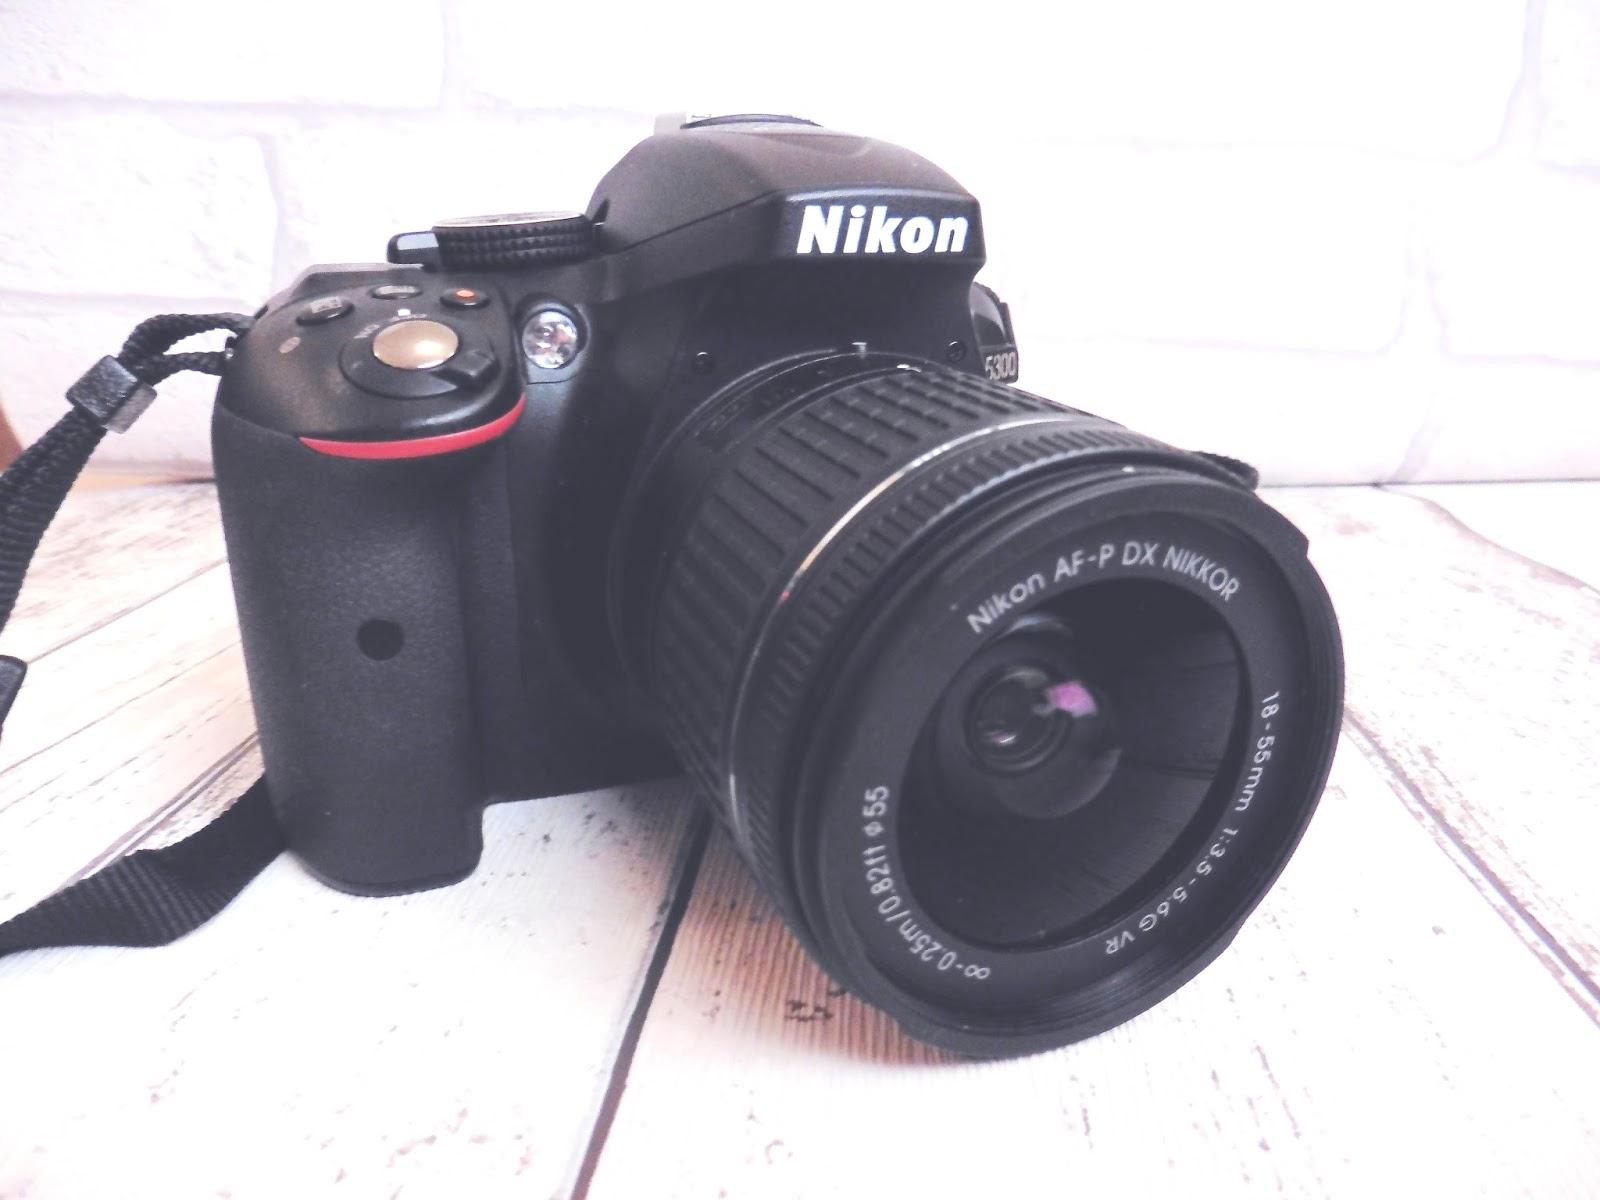 Canon vs Nikon - which dSLR to choose?